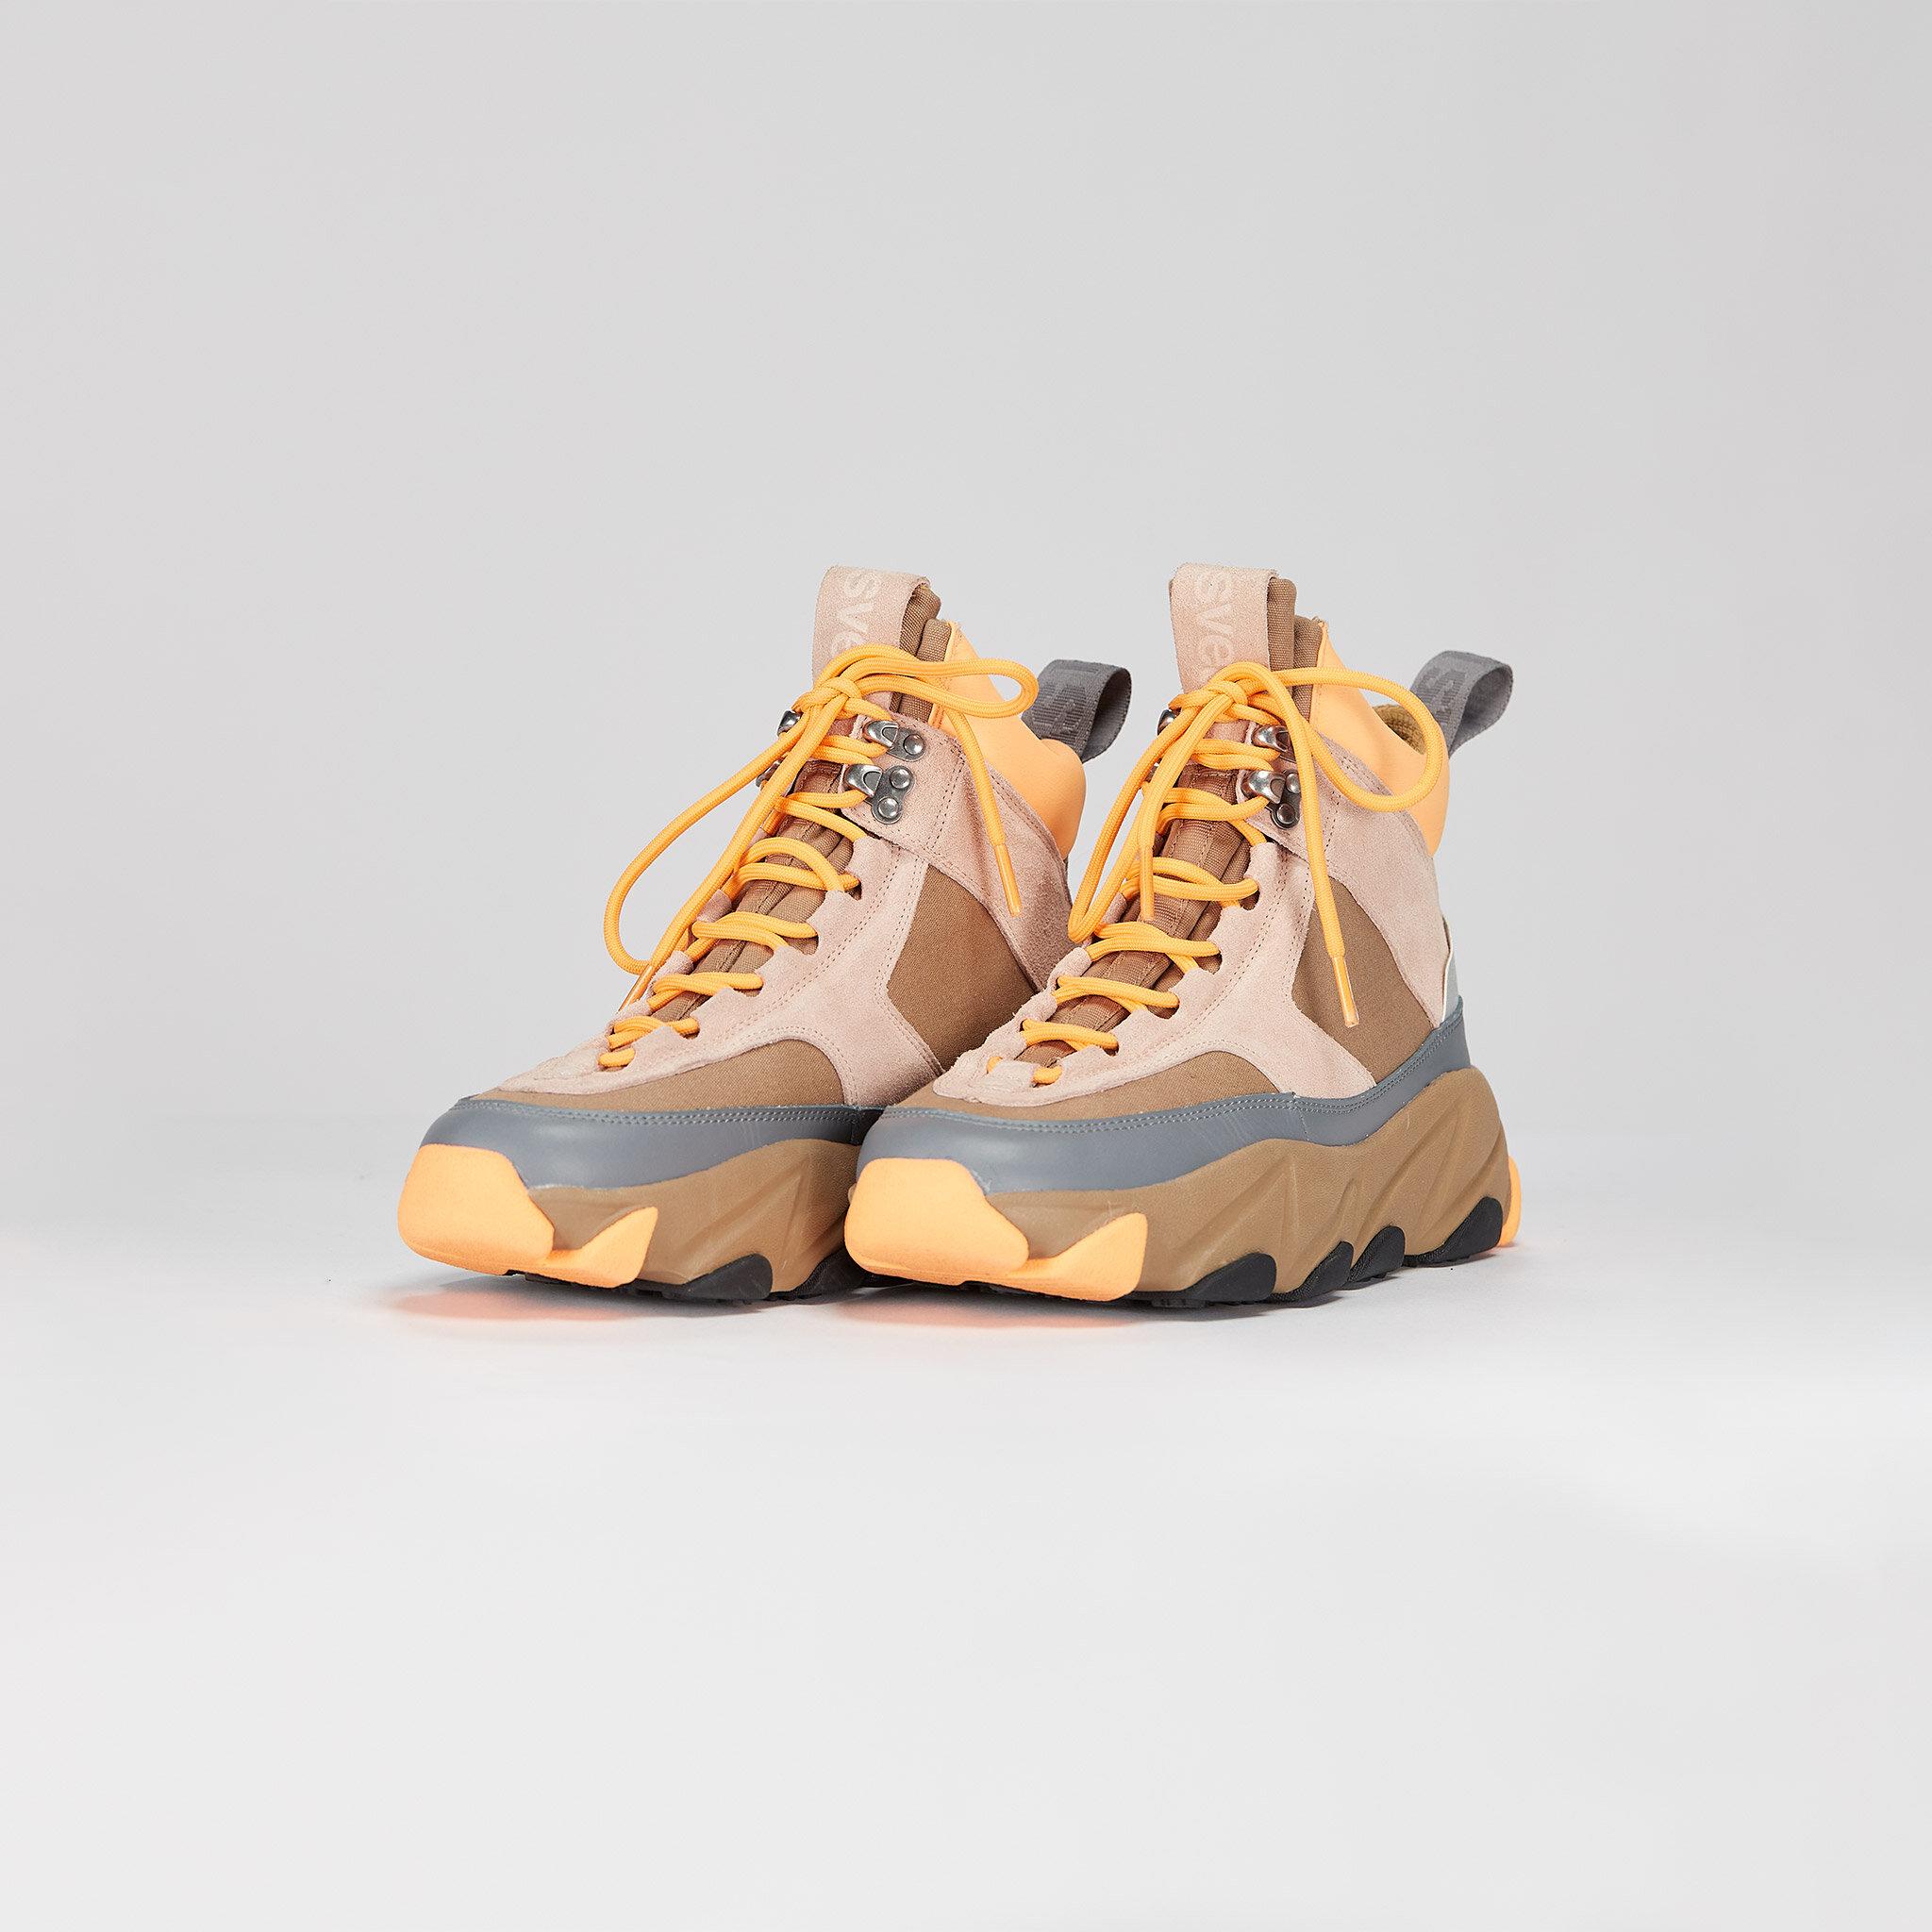 Fire Sneaker Boots